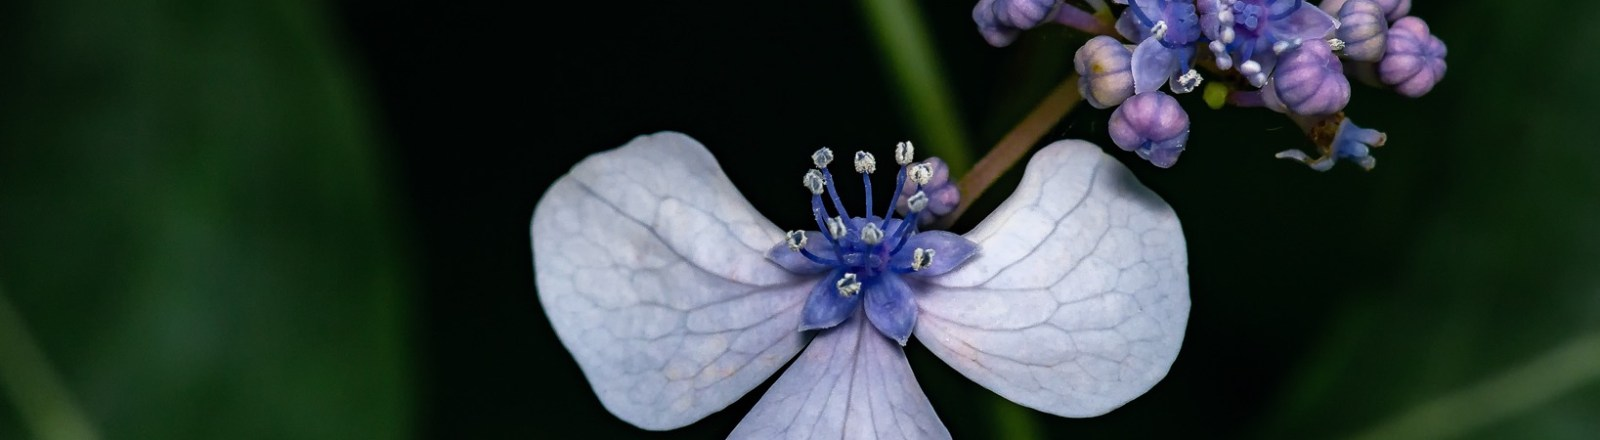 Exploring Photography: Hydrangea Gallery 4 of 4